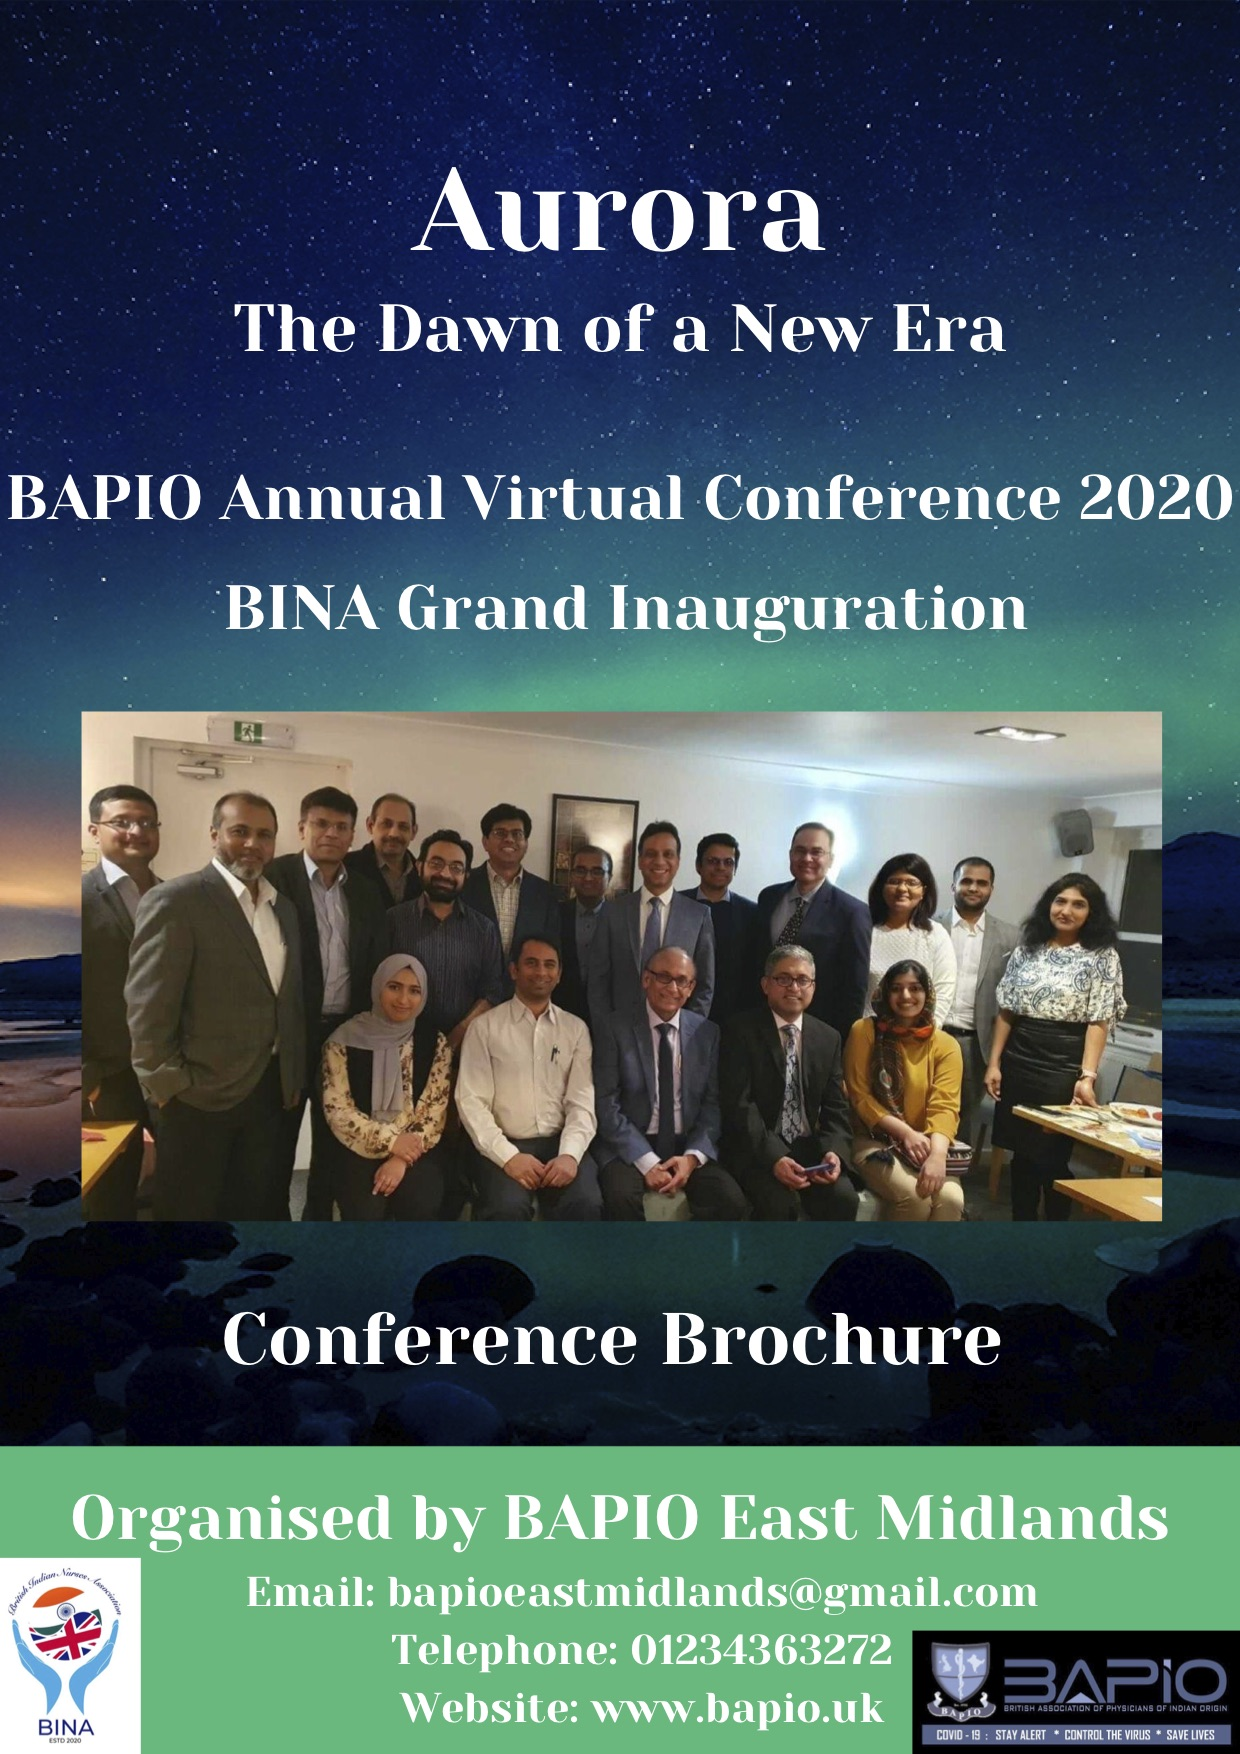 BINA Inauguration-Friday, 20 November 2020